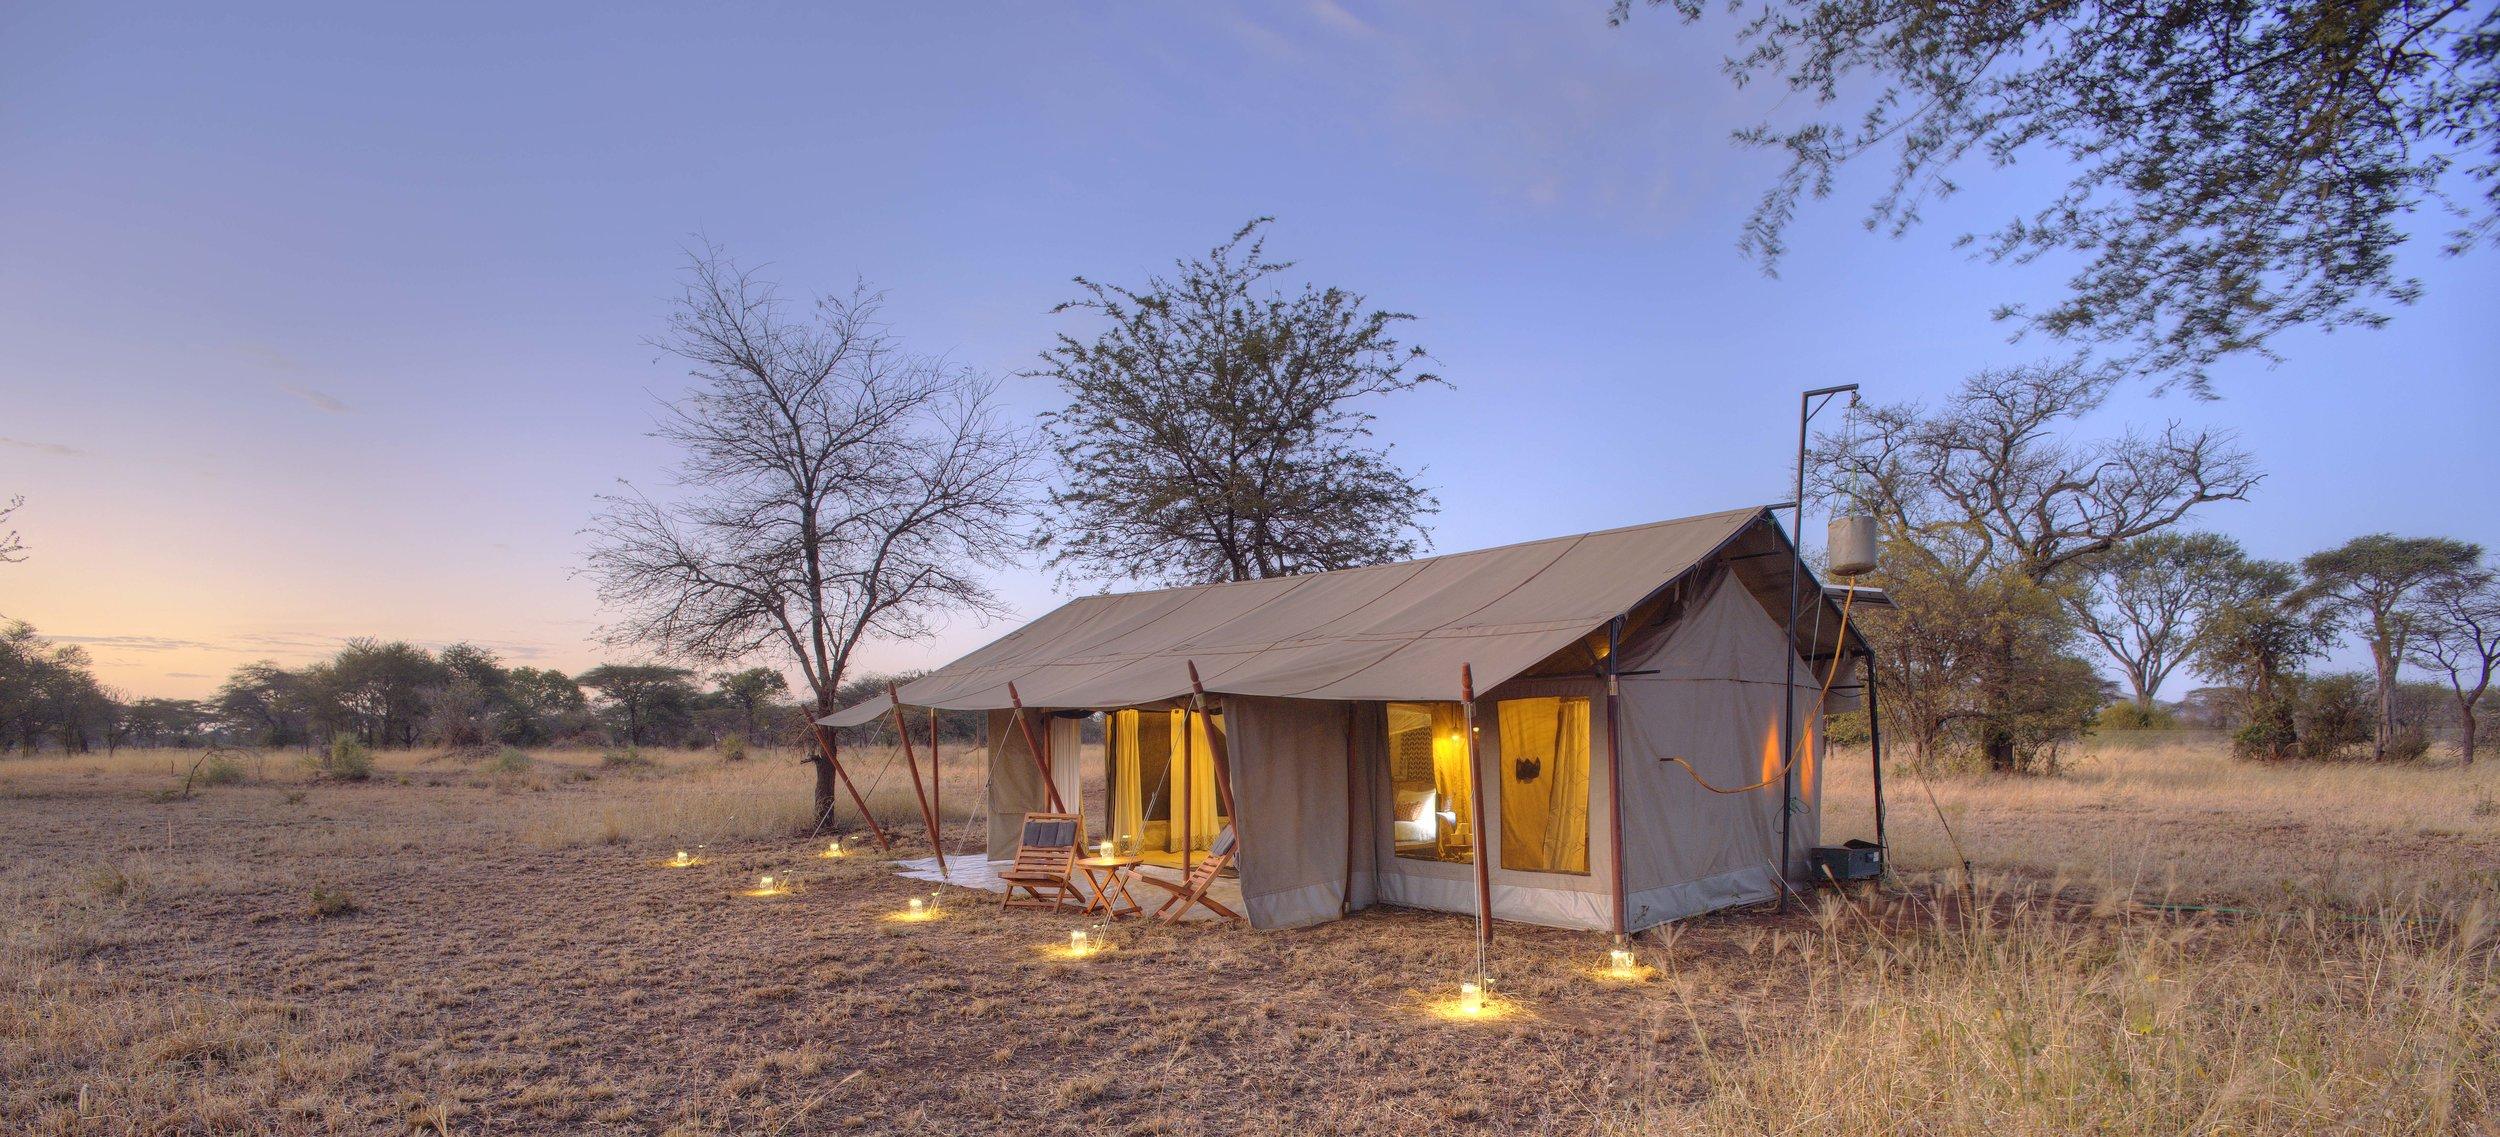 ubuntu-camp-guest-tent-exterior.jpg